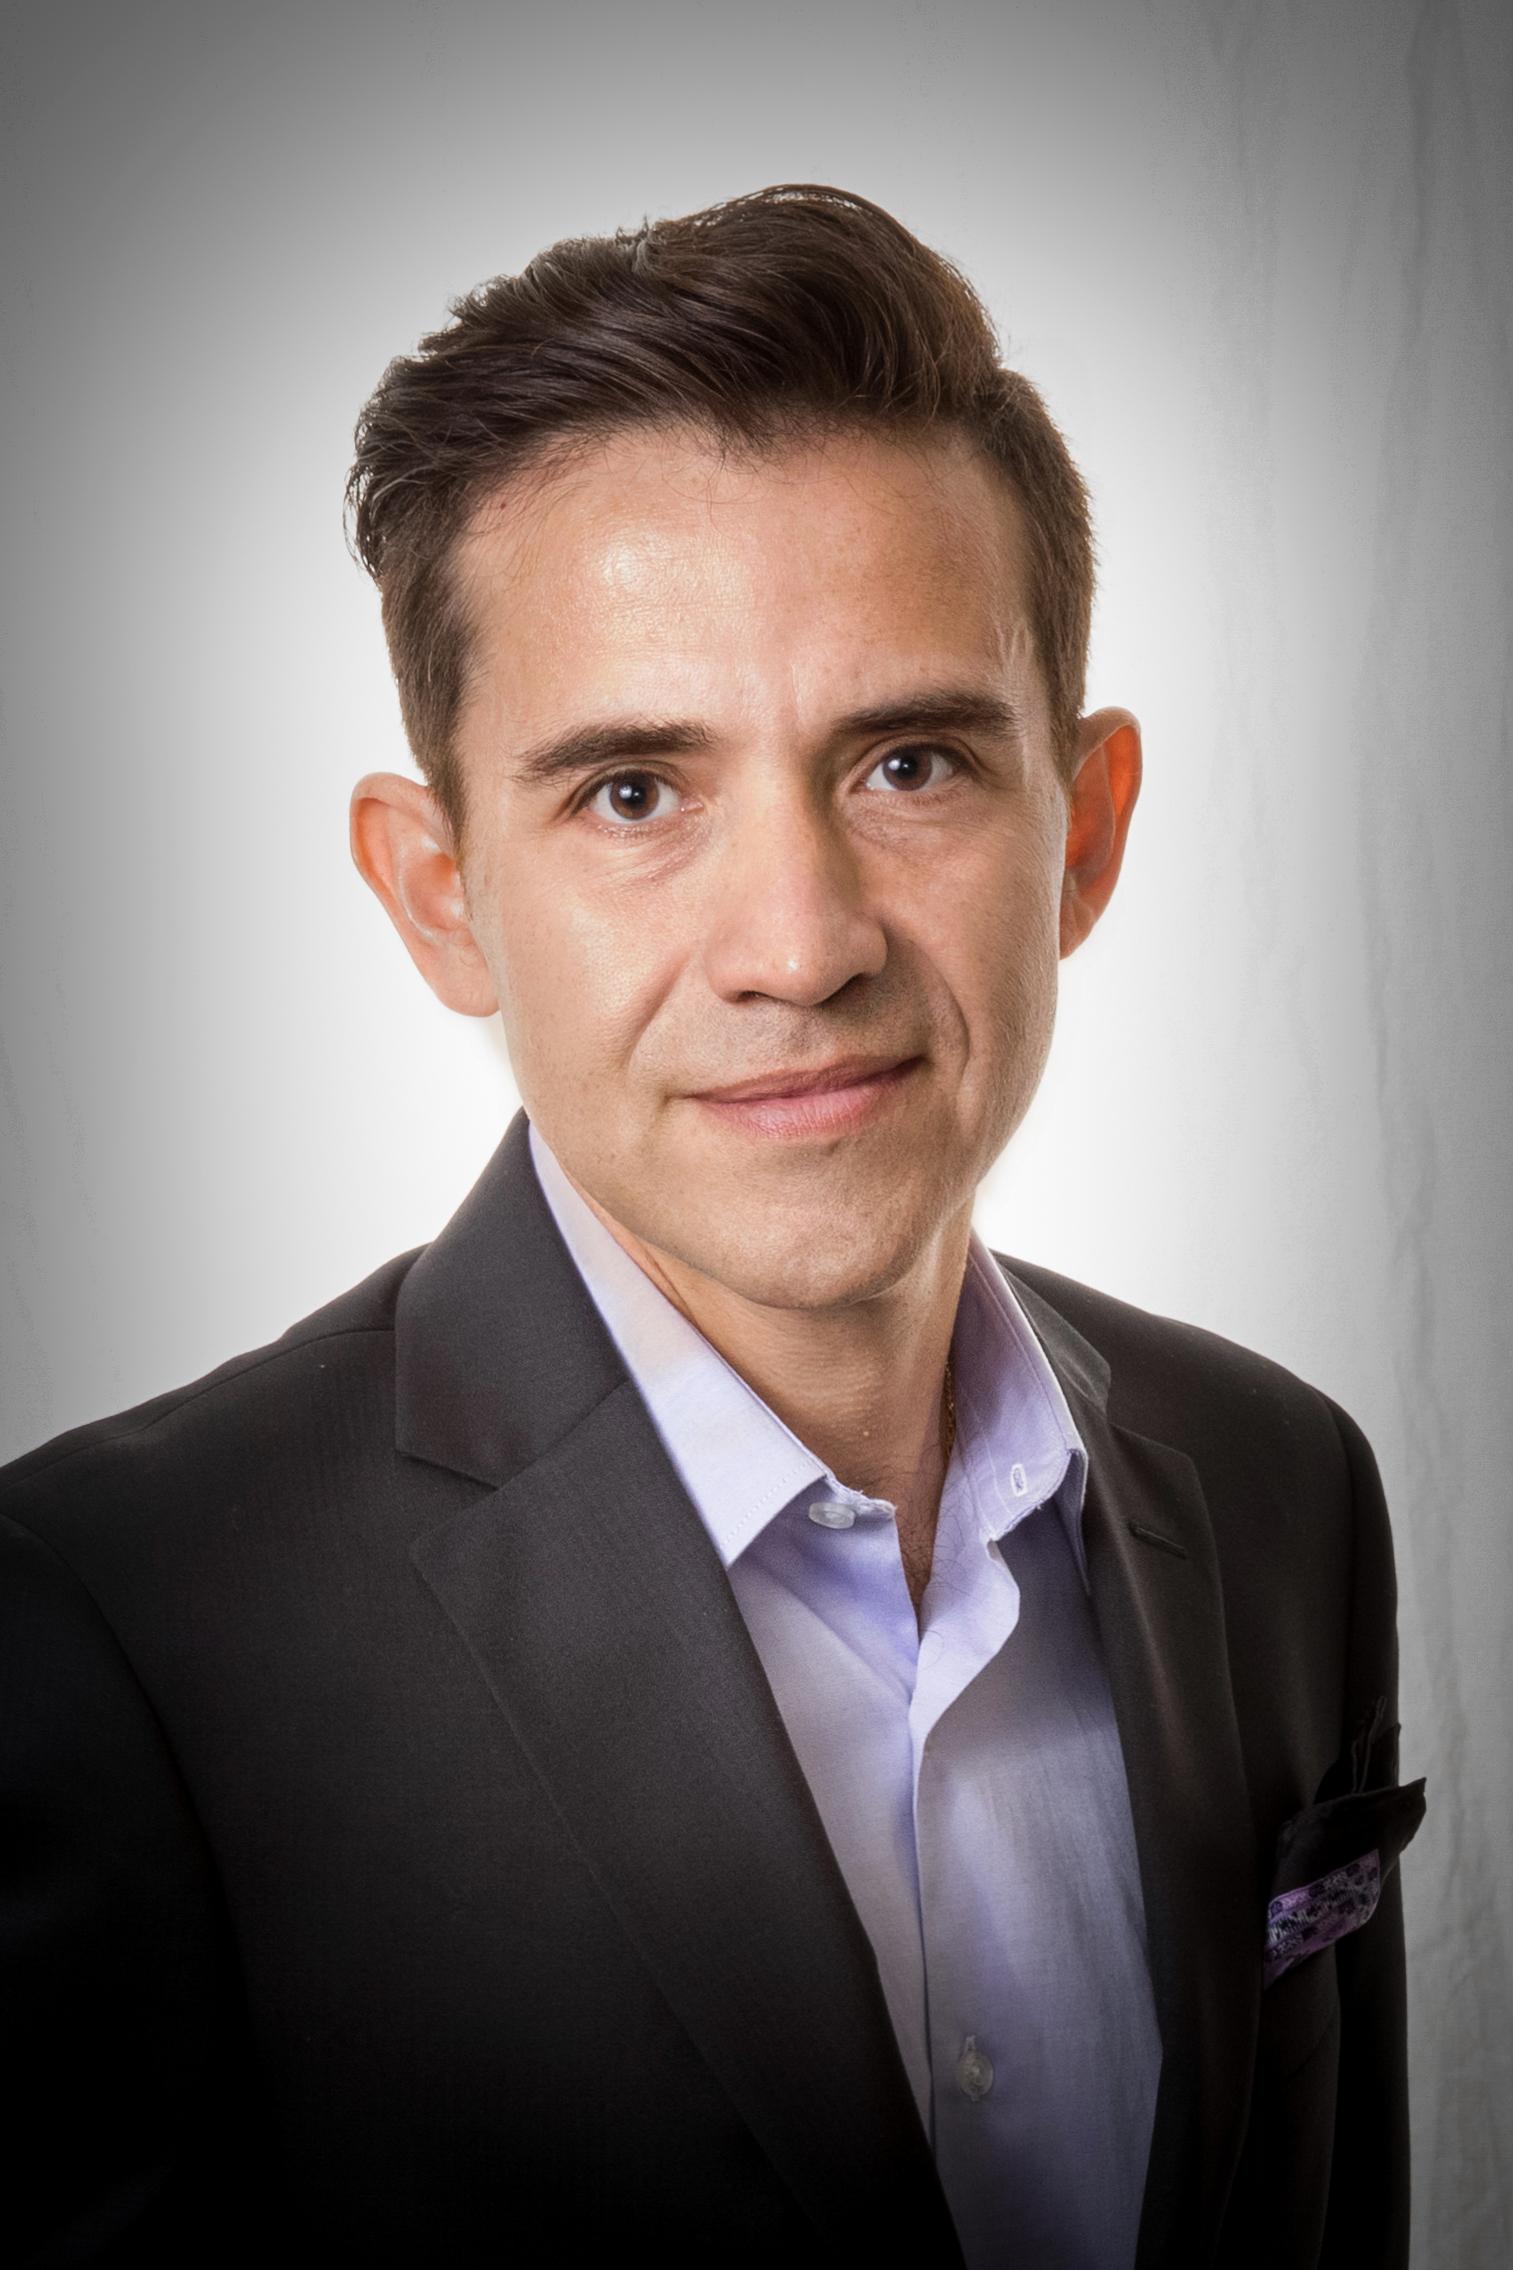 Sergio Bejar-Lopez Portrait